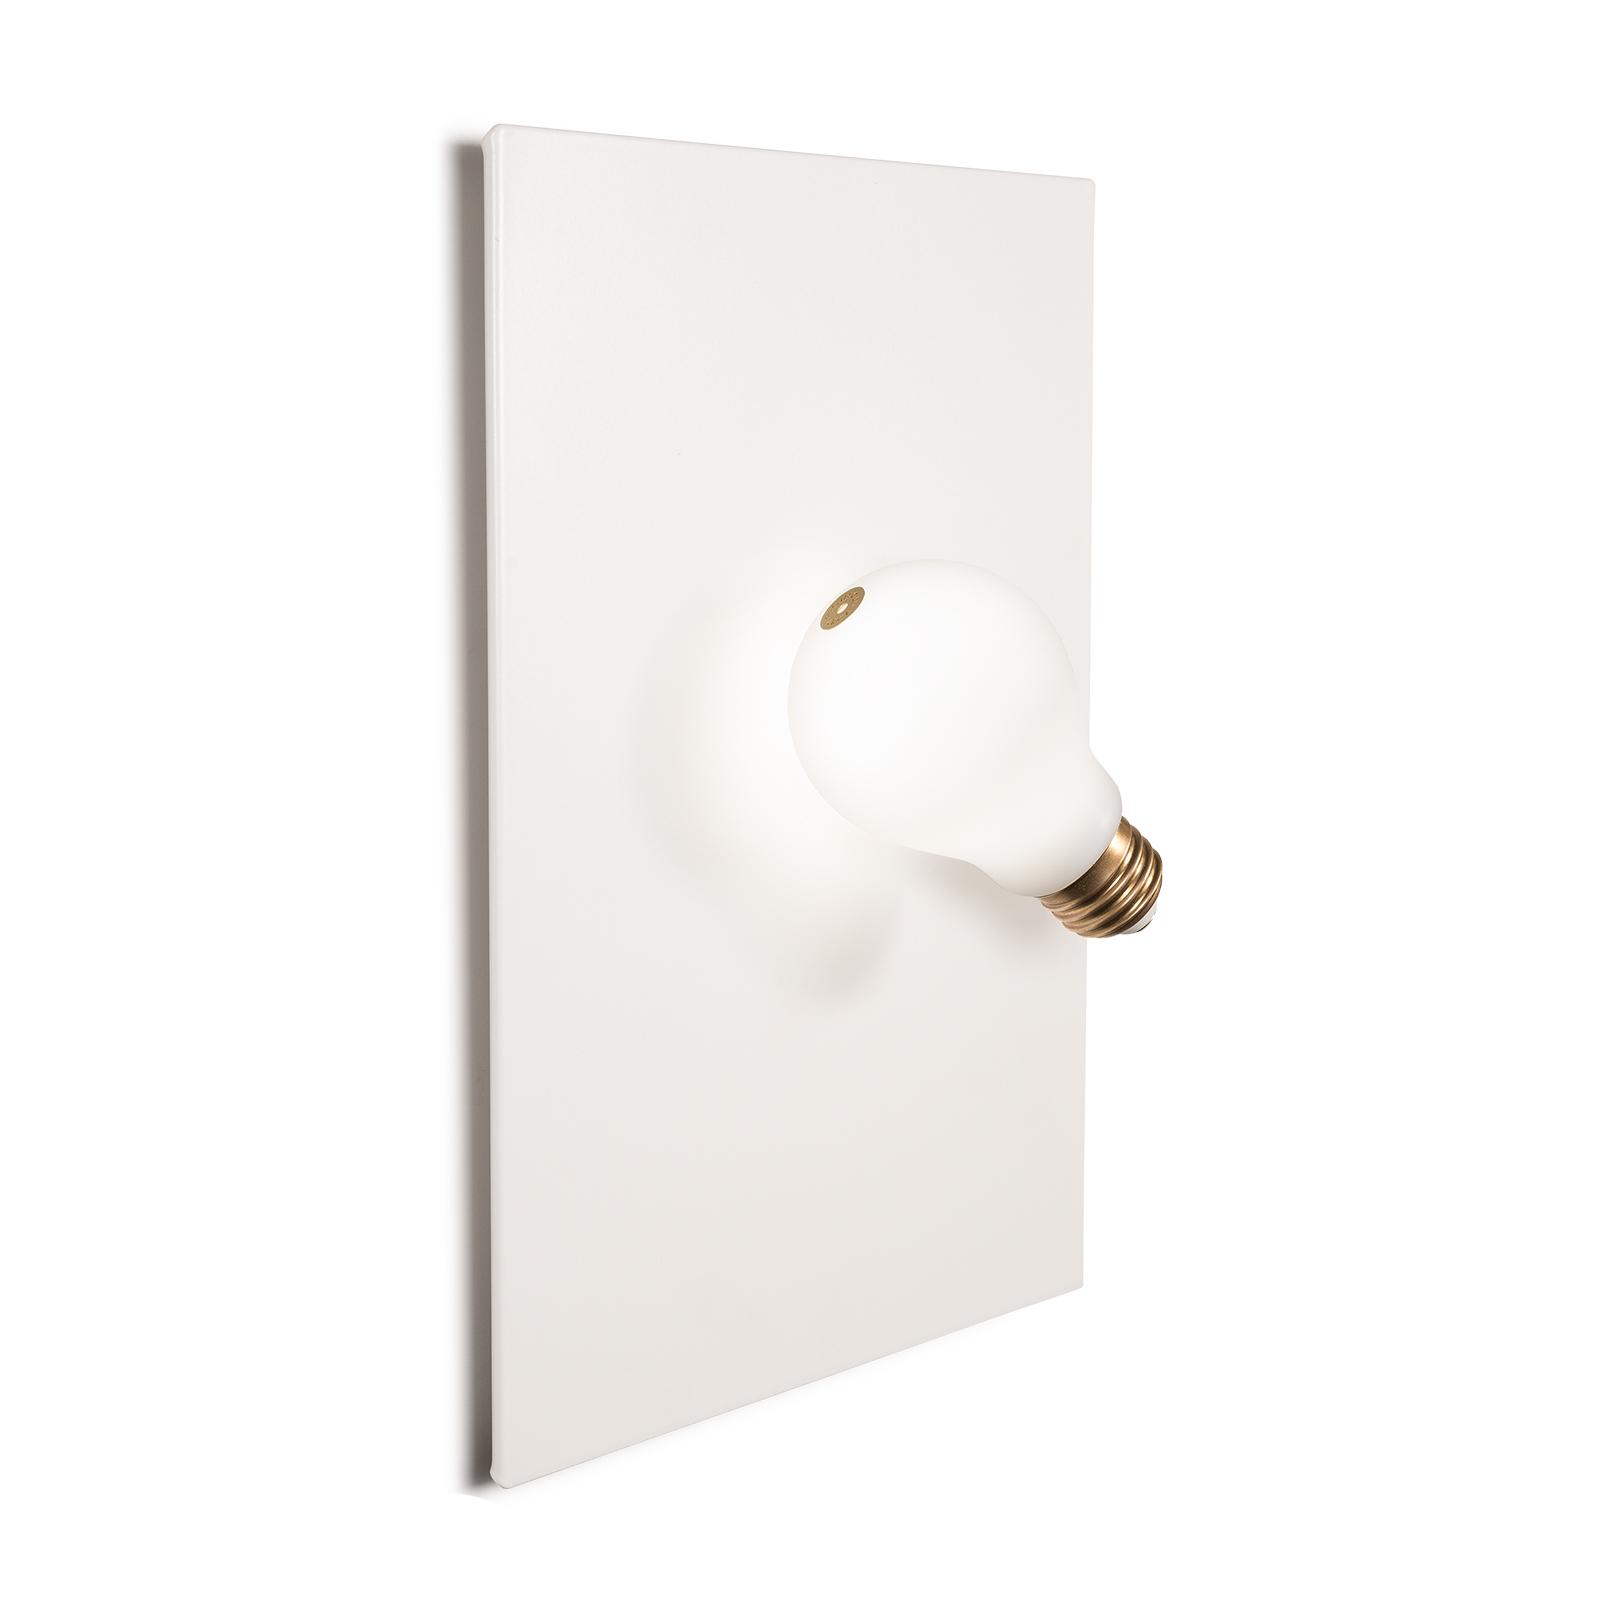 Slamp Idea LED-Wandleuchte, weiß